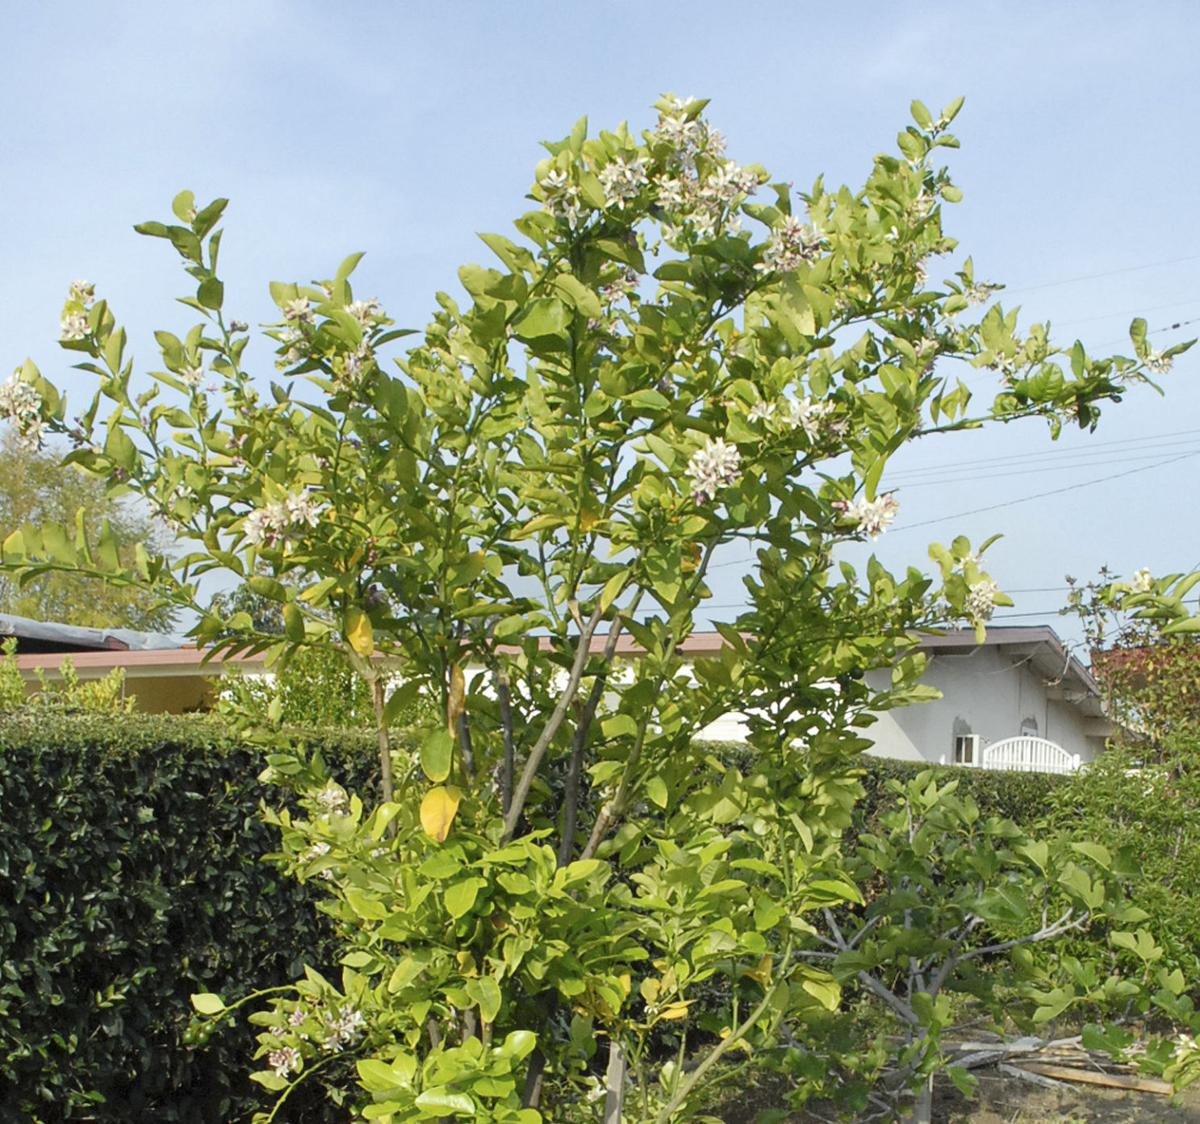 How California copes with Asian citrus psyllids